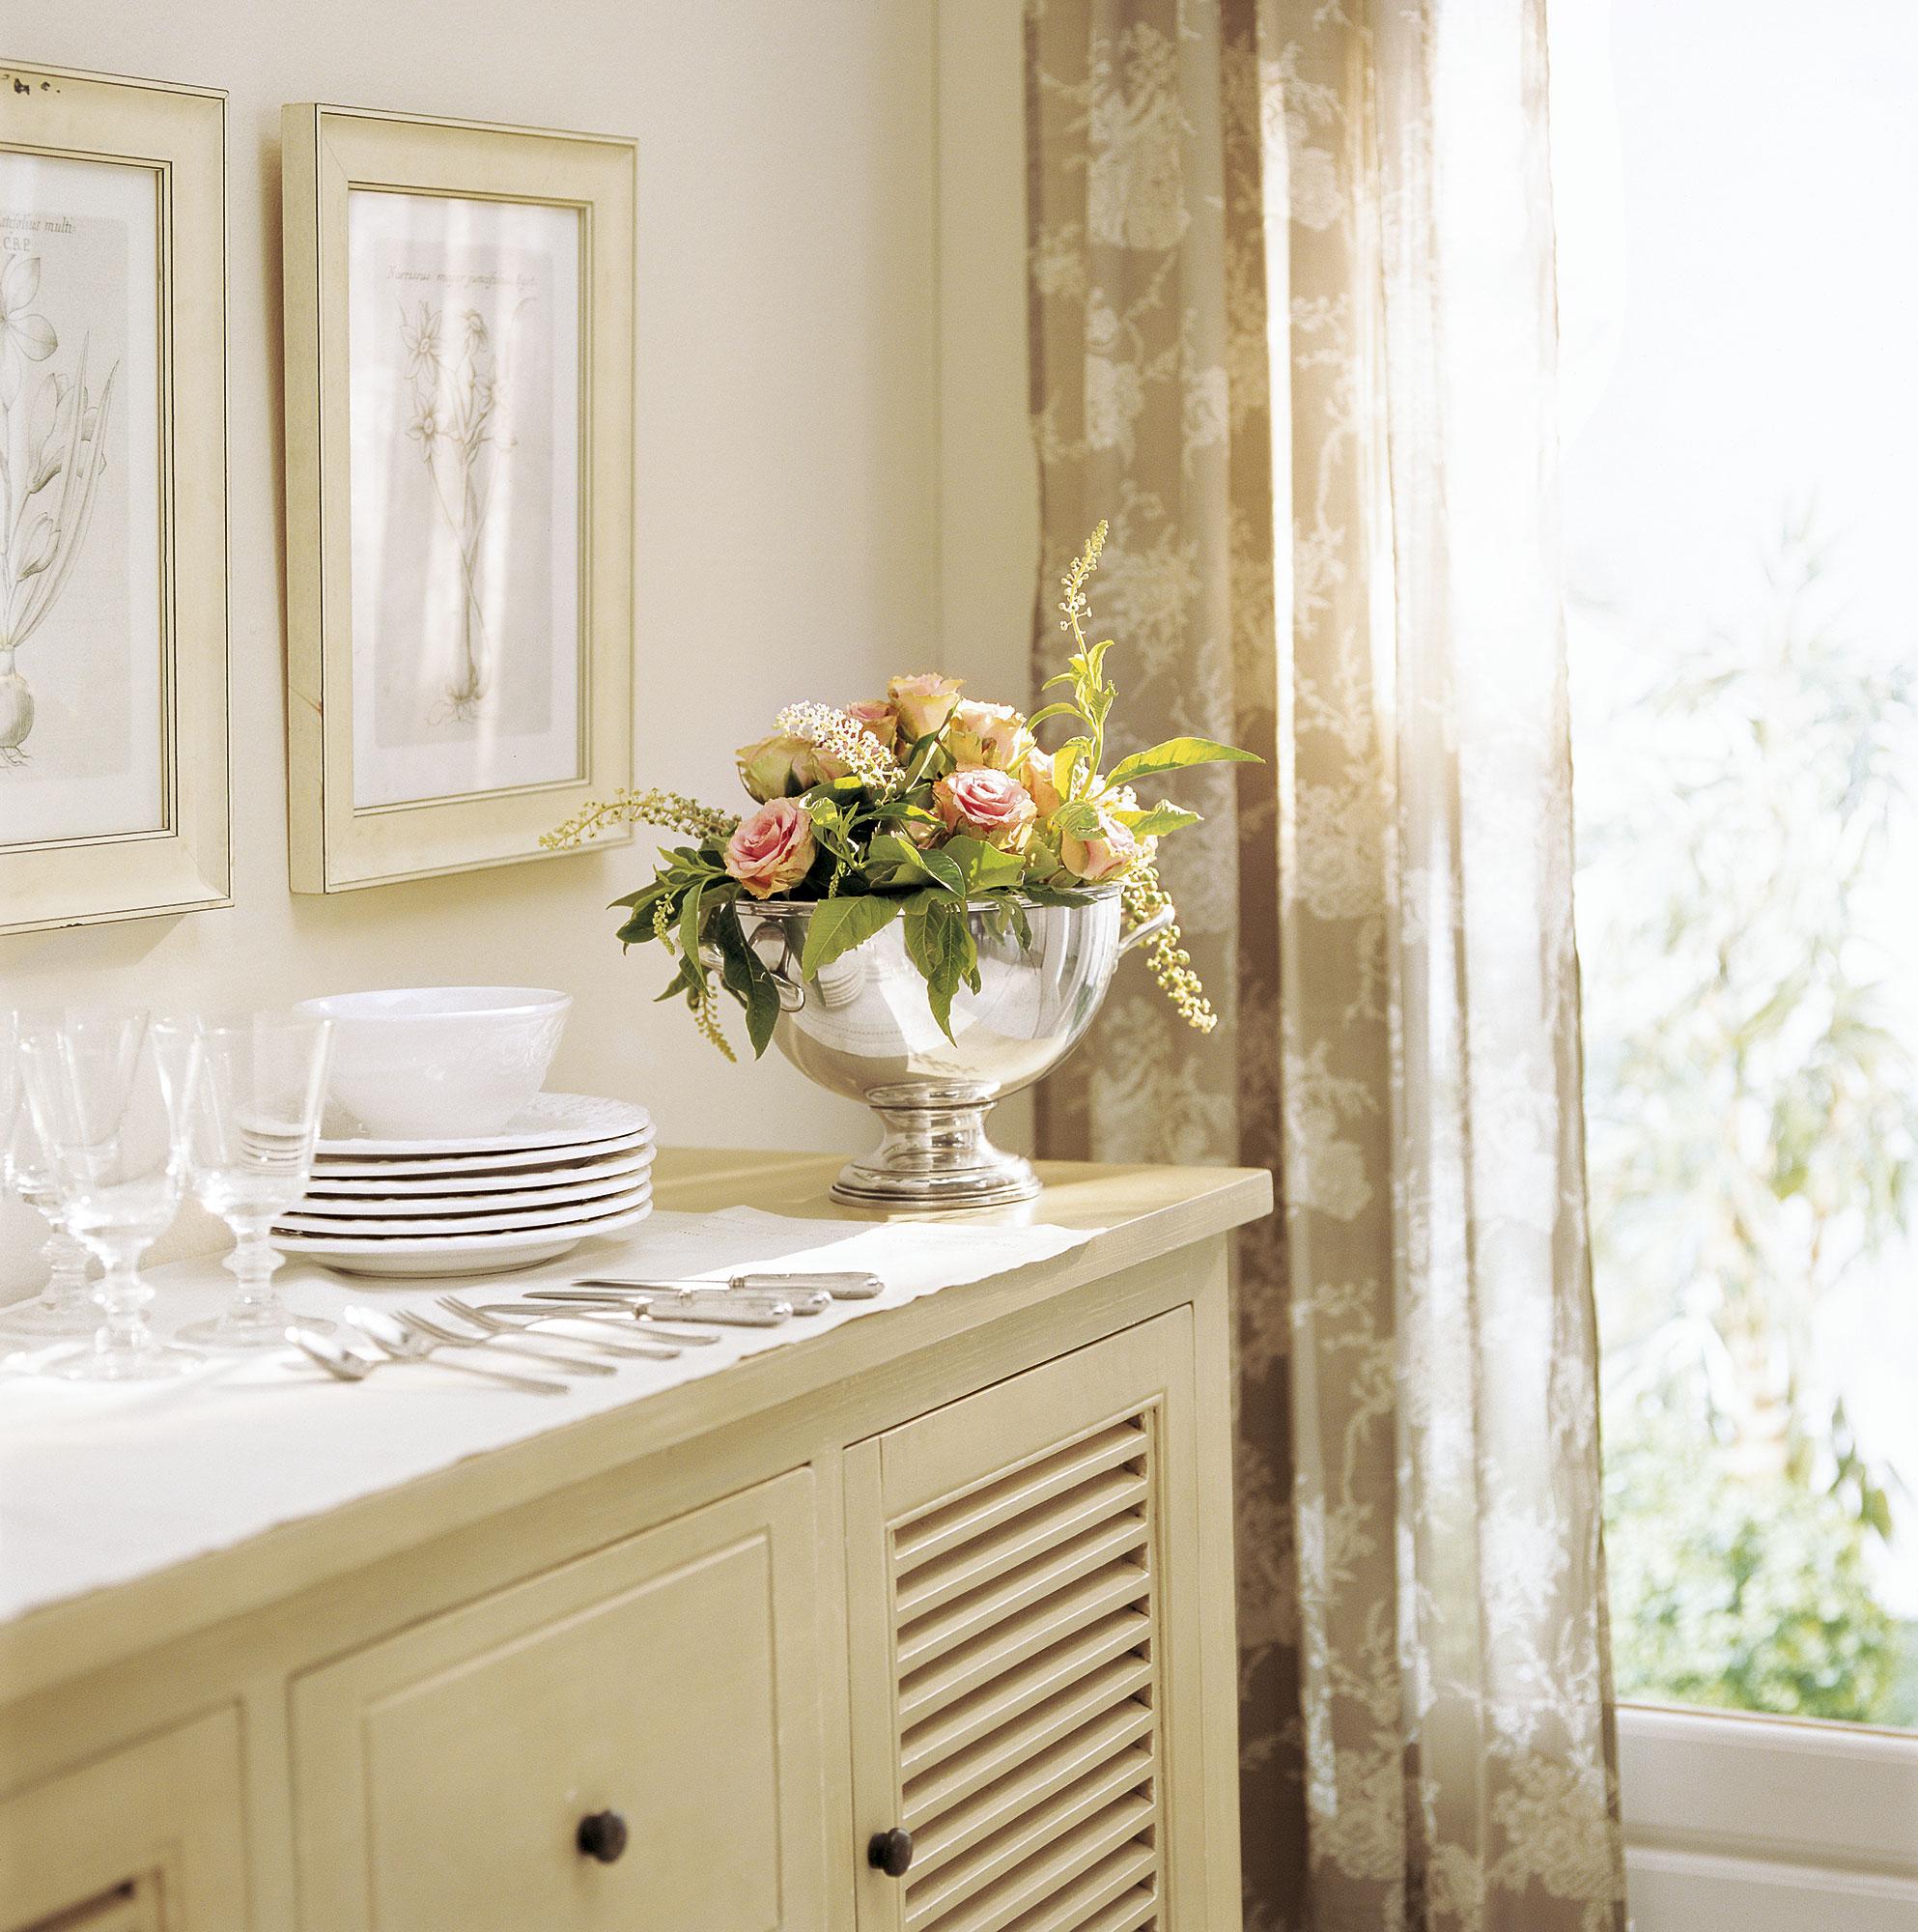 C mo elegir la cortina perfecta para cada ventana for Cortinas cocina confeccionadas